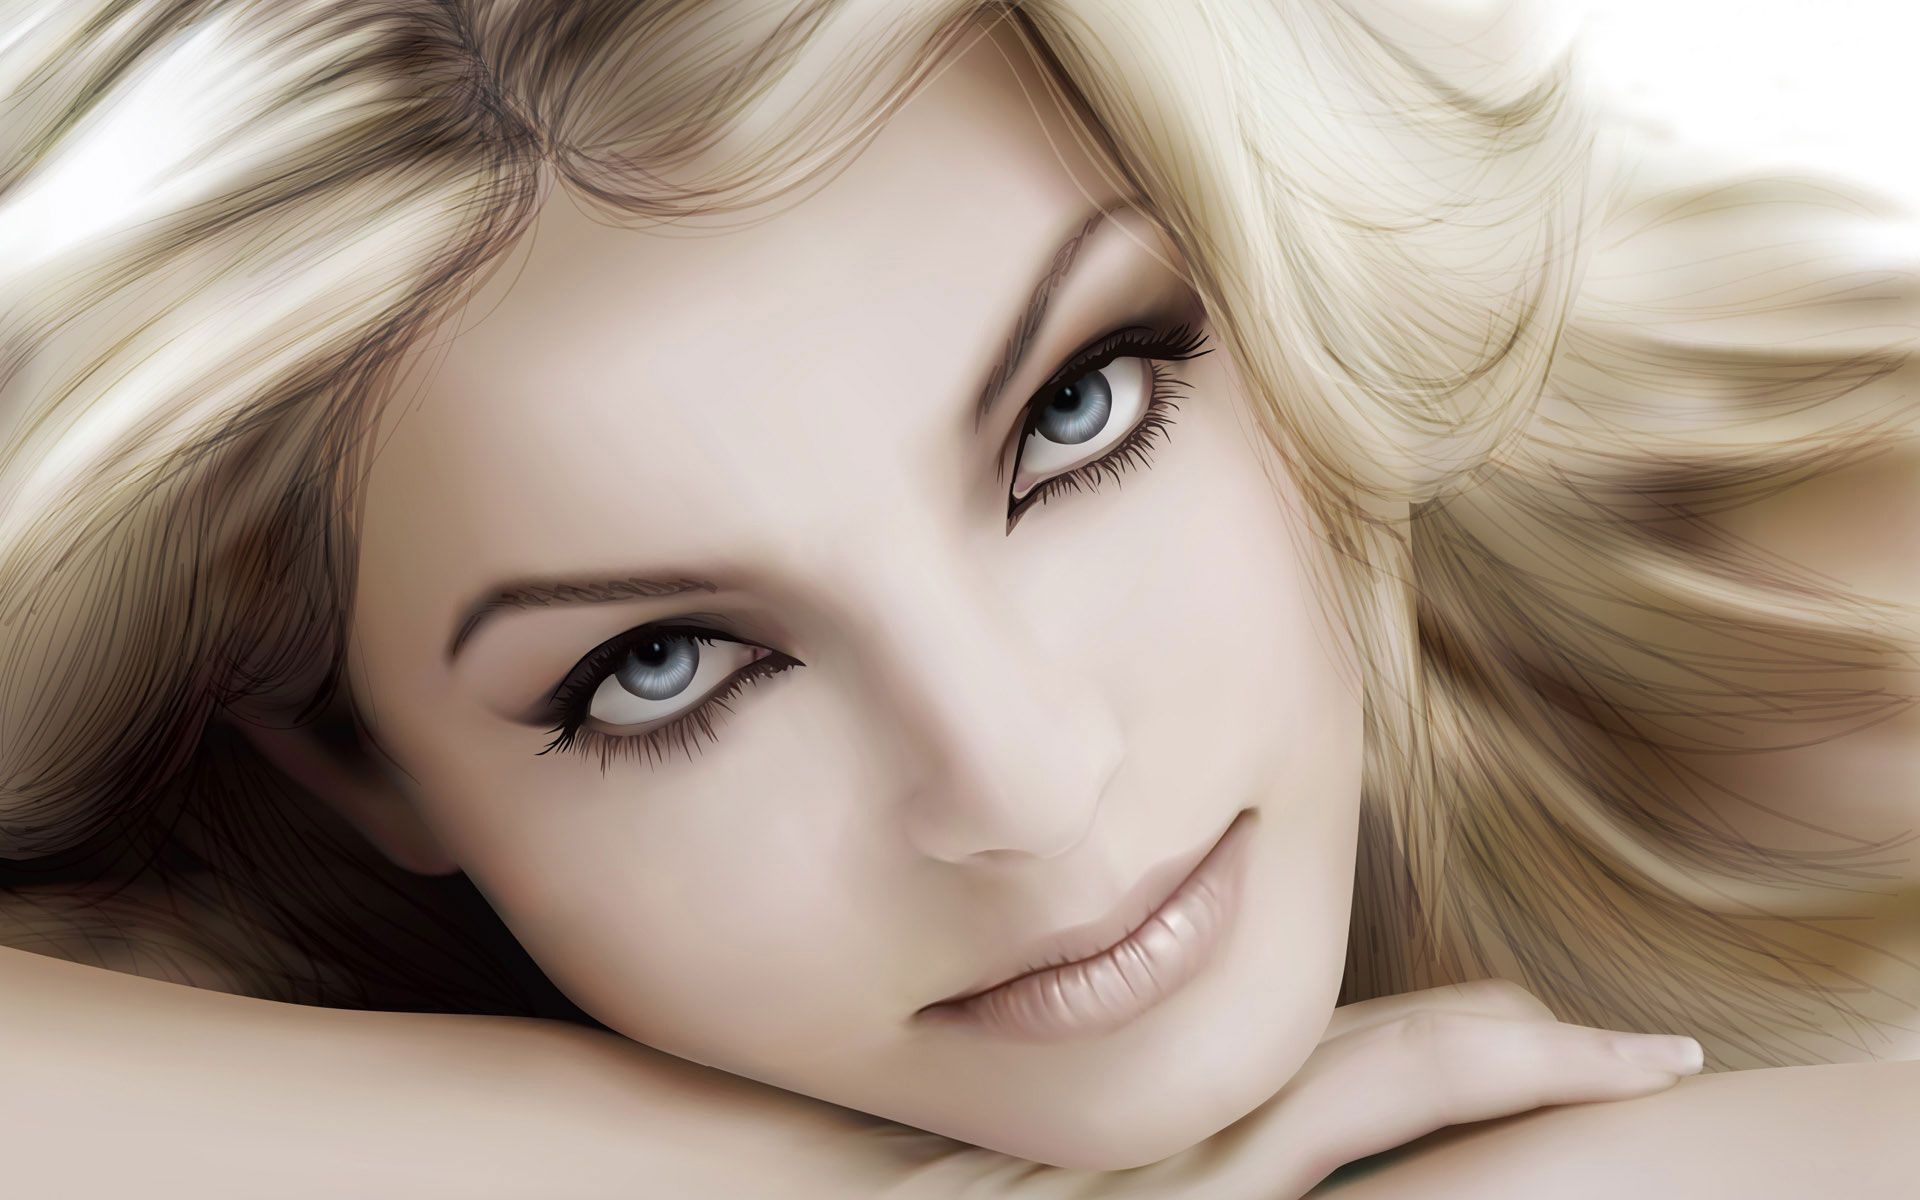 Beautiful Girl Hd Wallpapers 1080p Free Download Beautiful Girl Images, Photos, Reviews